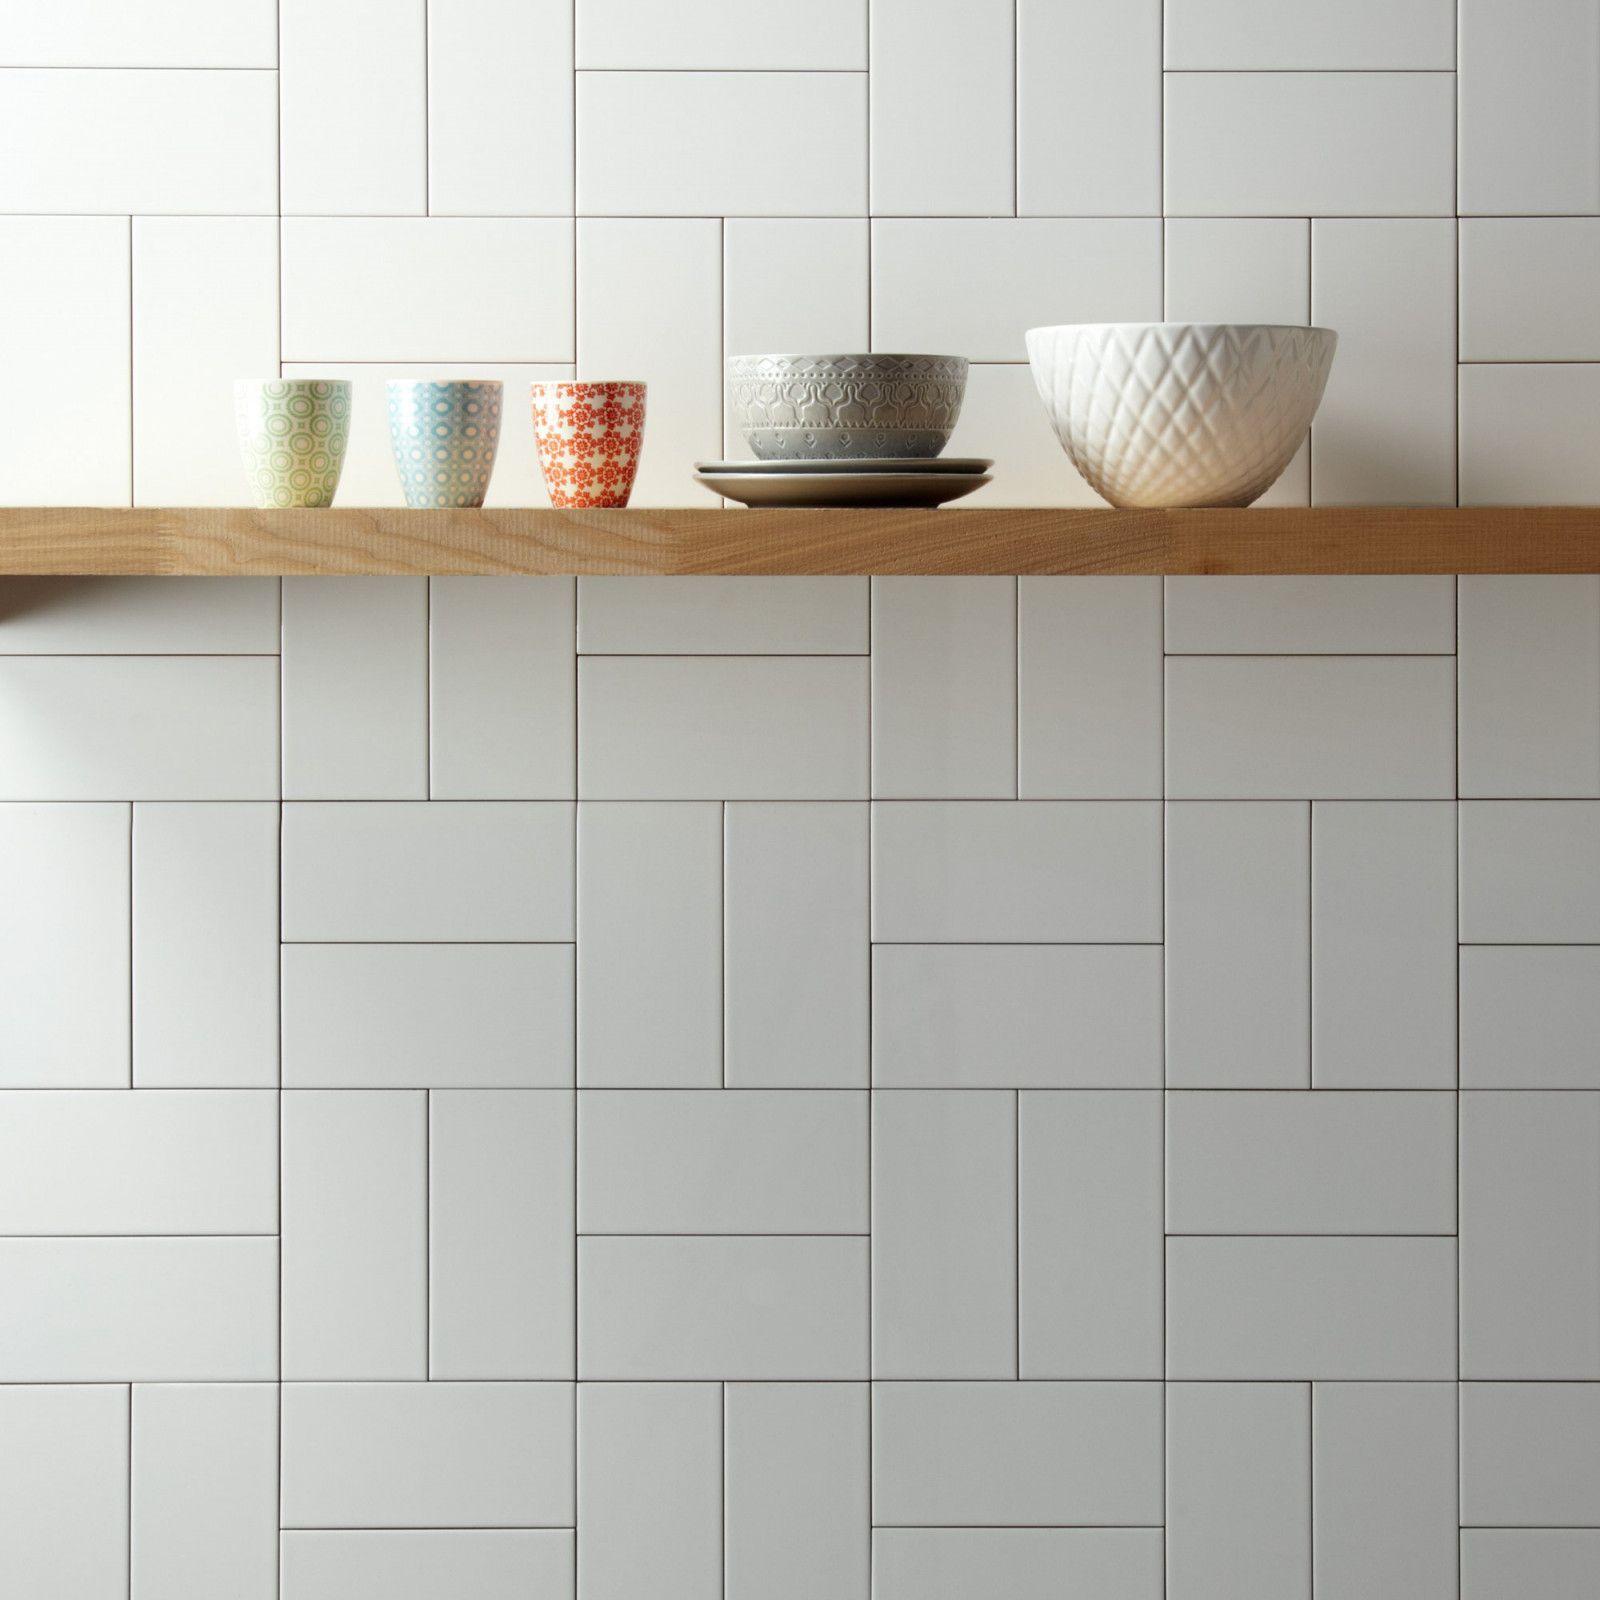 British Ceramic Tile Metro White Flat Gloss Wall British Ceramic Tile Modern Kitchen Backsplash Kitchen Wall Tiles White Bathroom Tiles